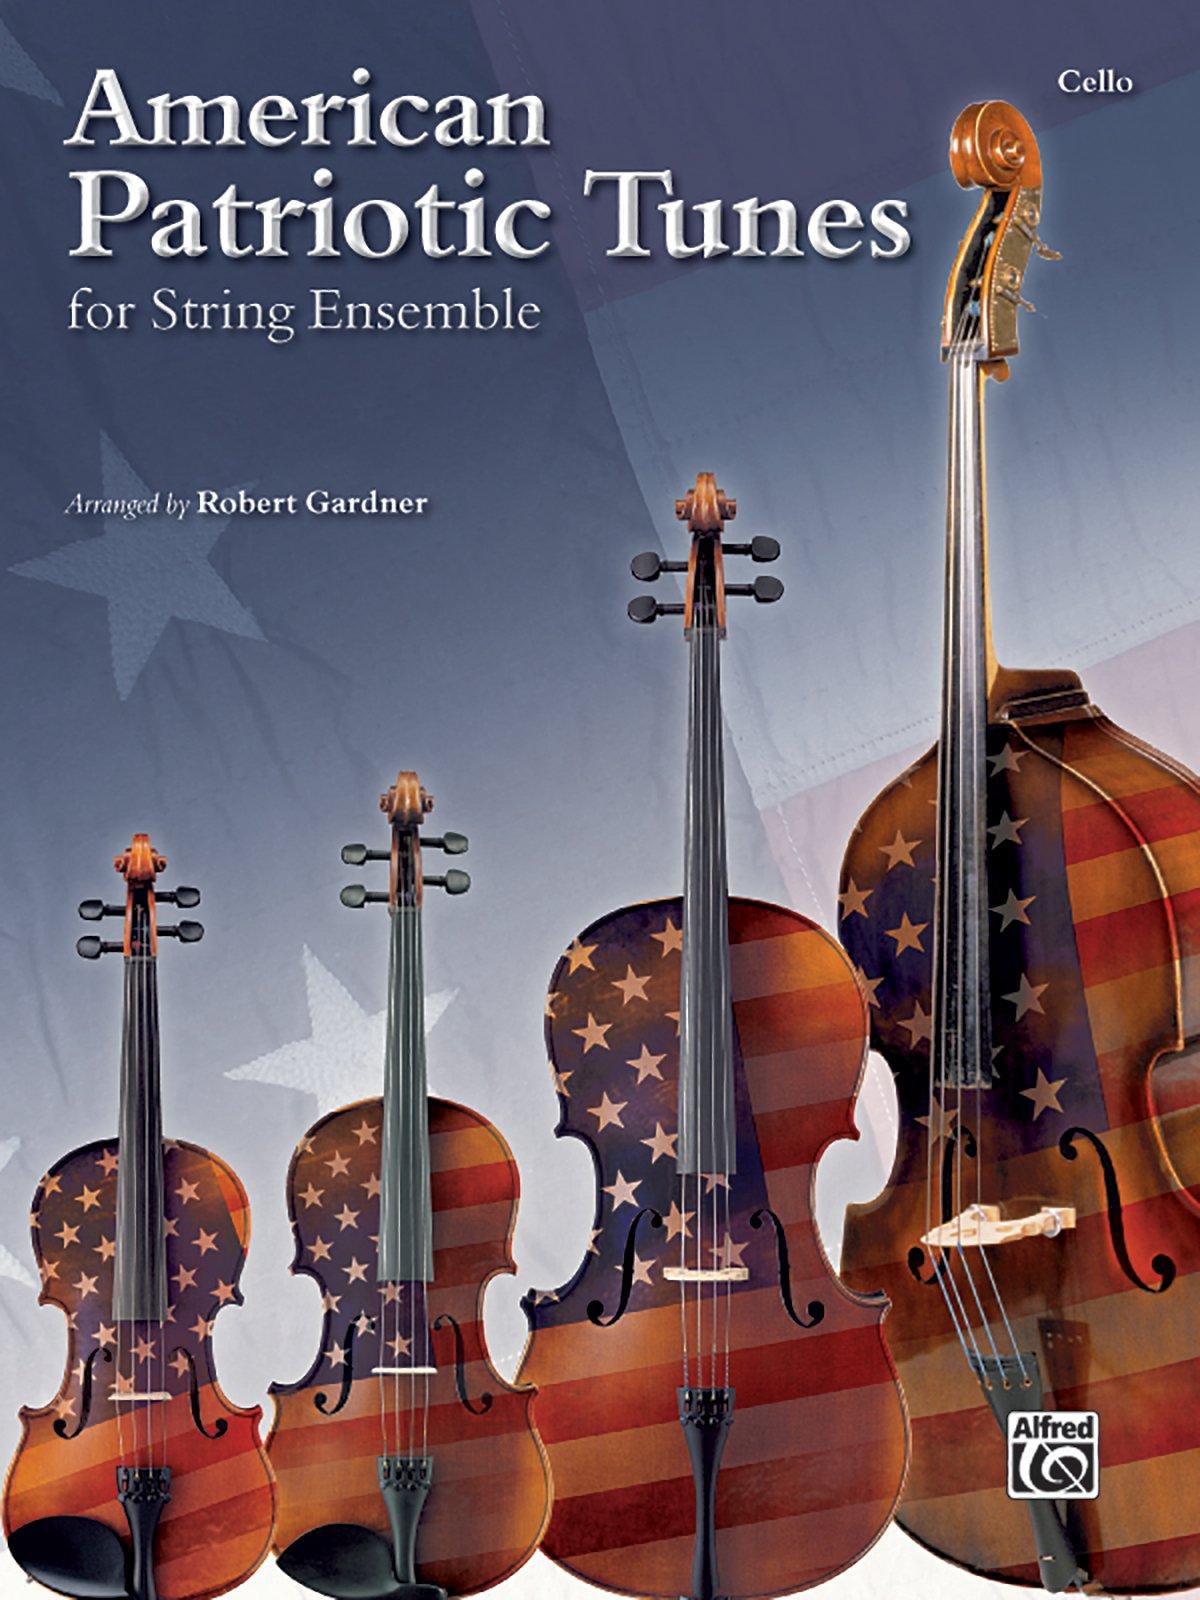 American Patriotic Tunes for String Ensemble: Cello